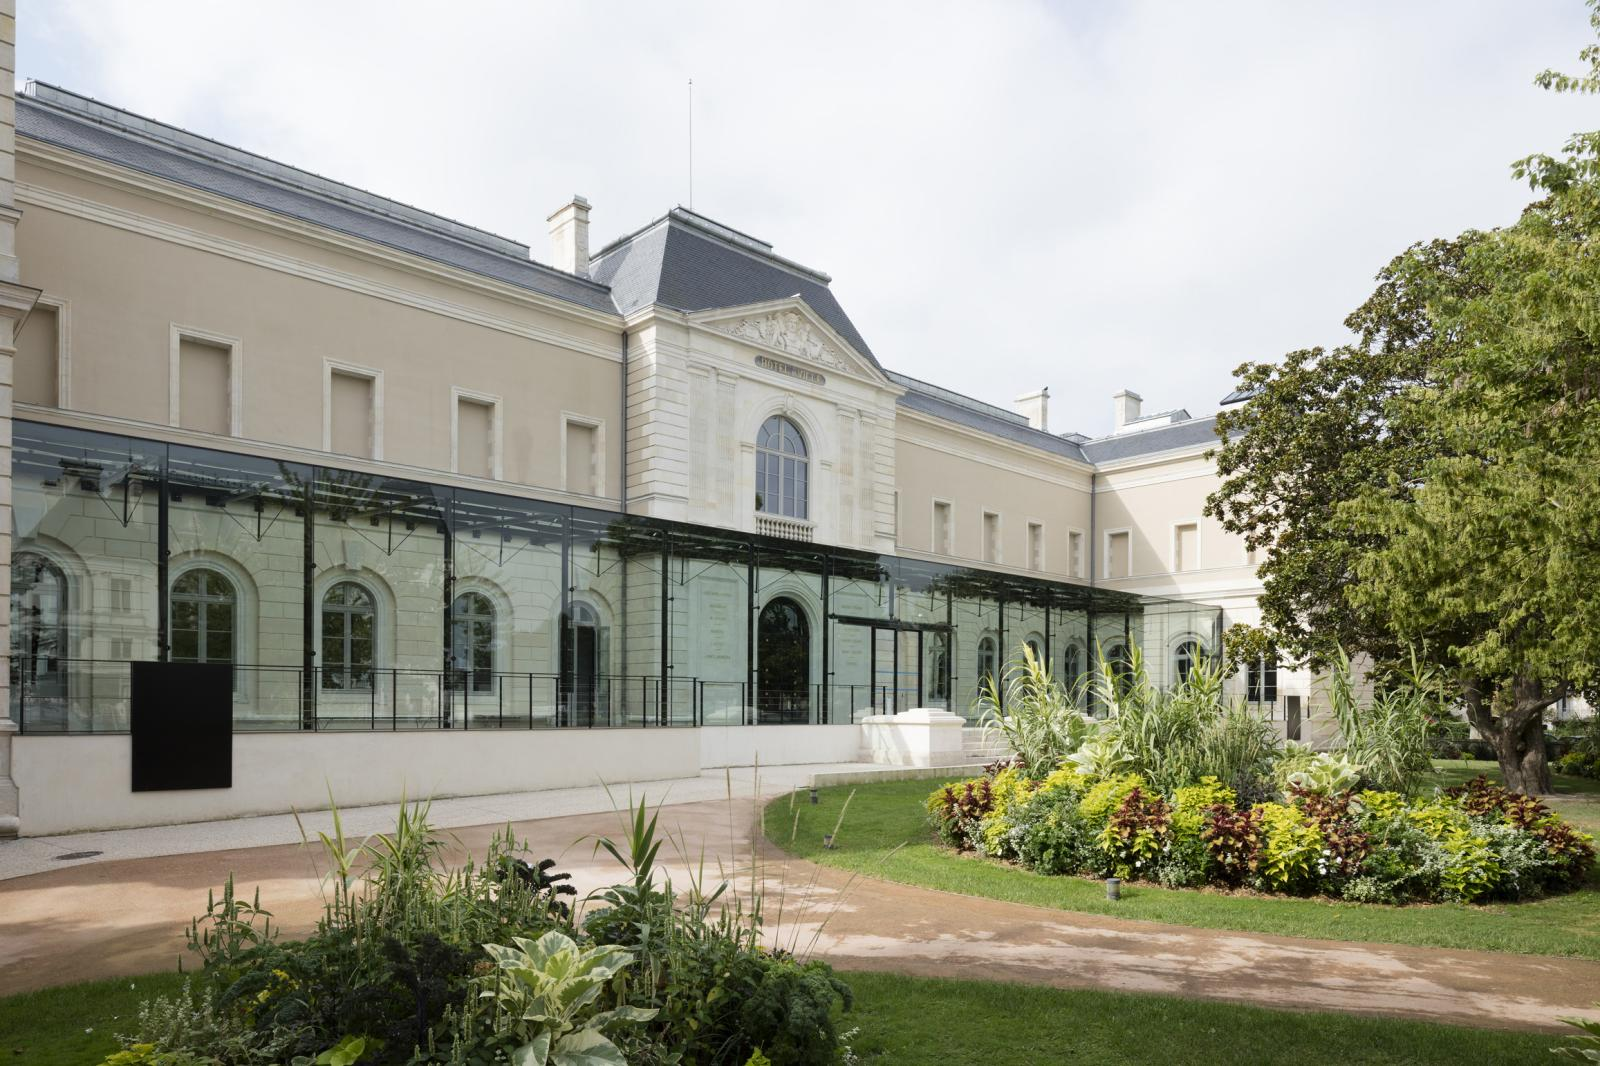 La façade rénovée du musée Girodet.